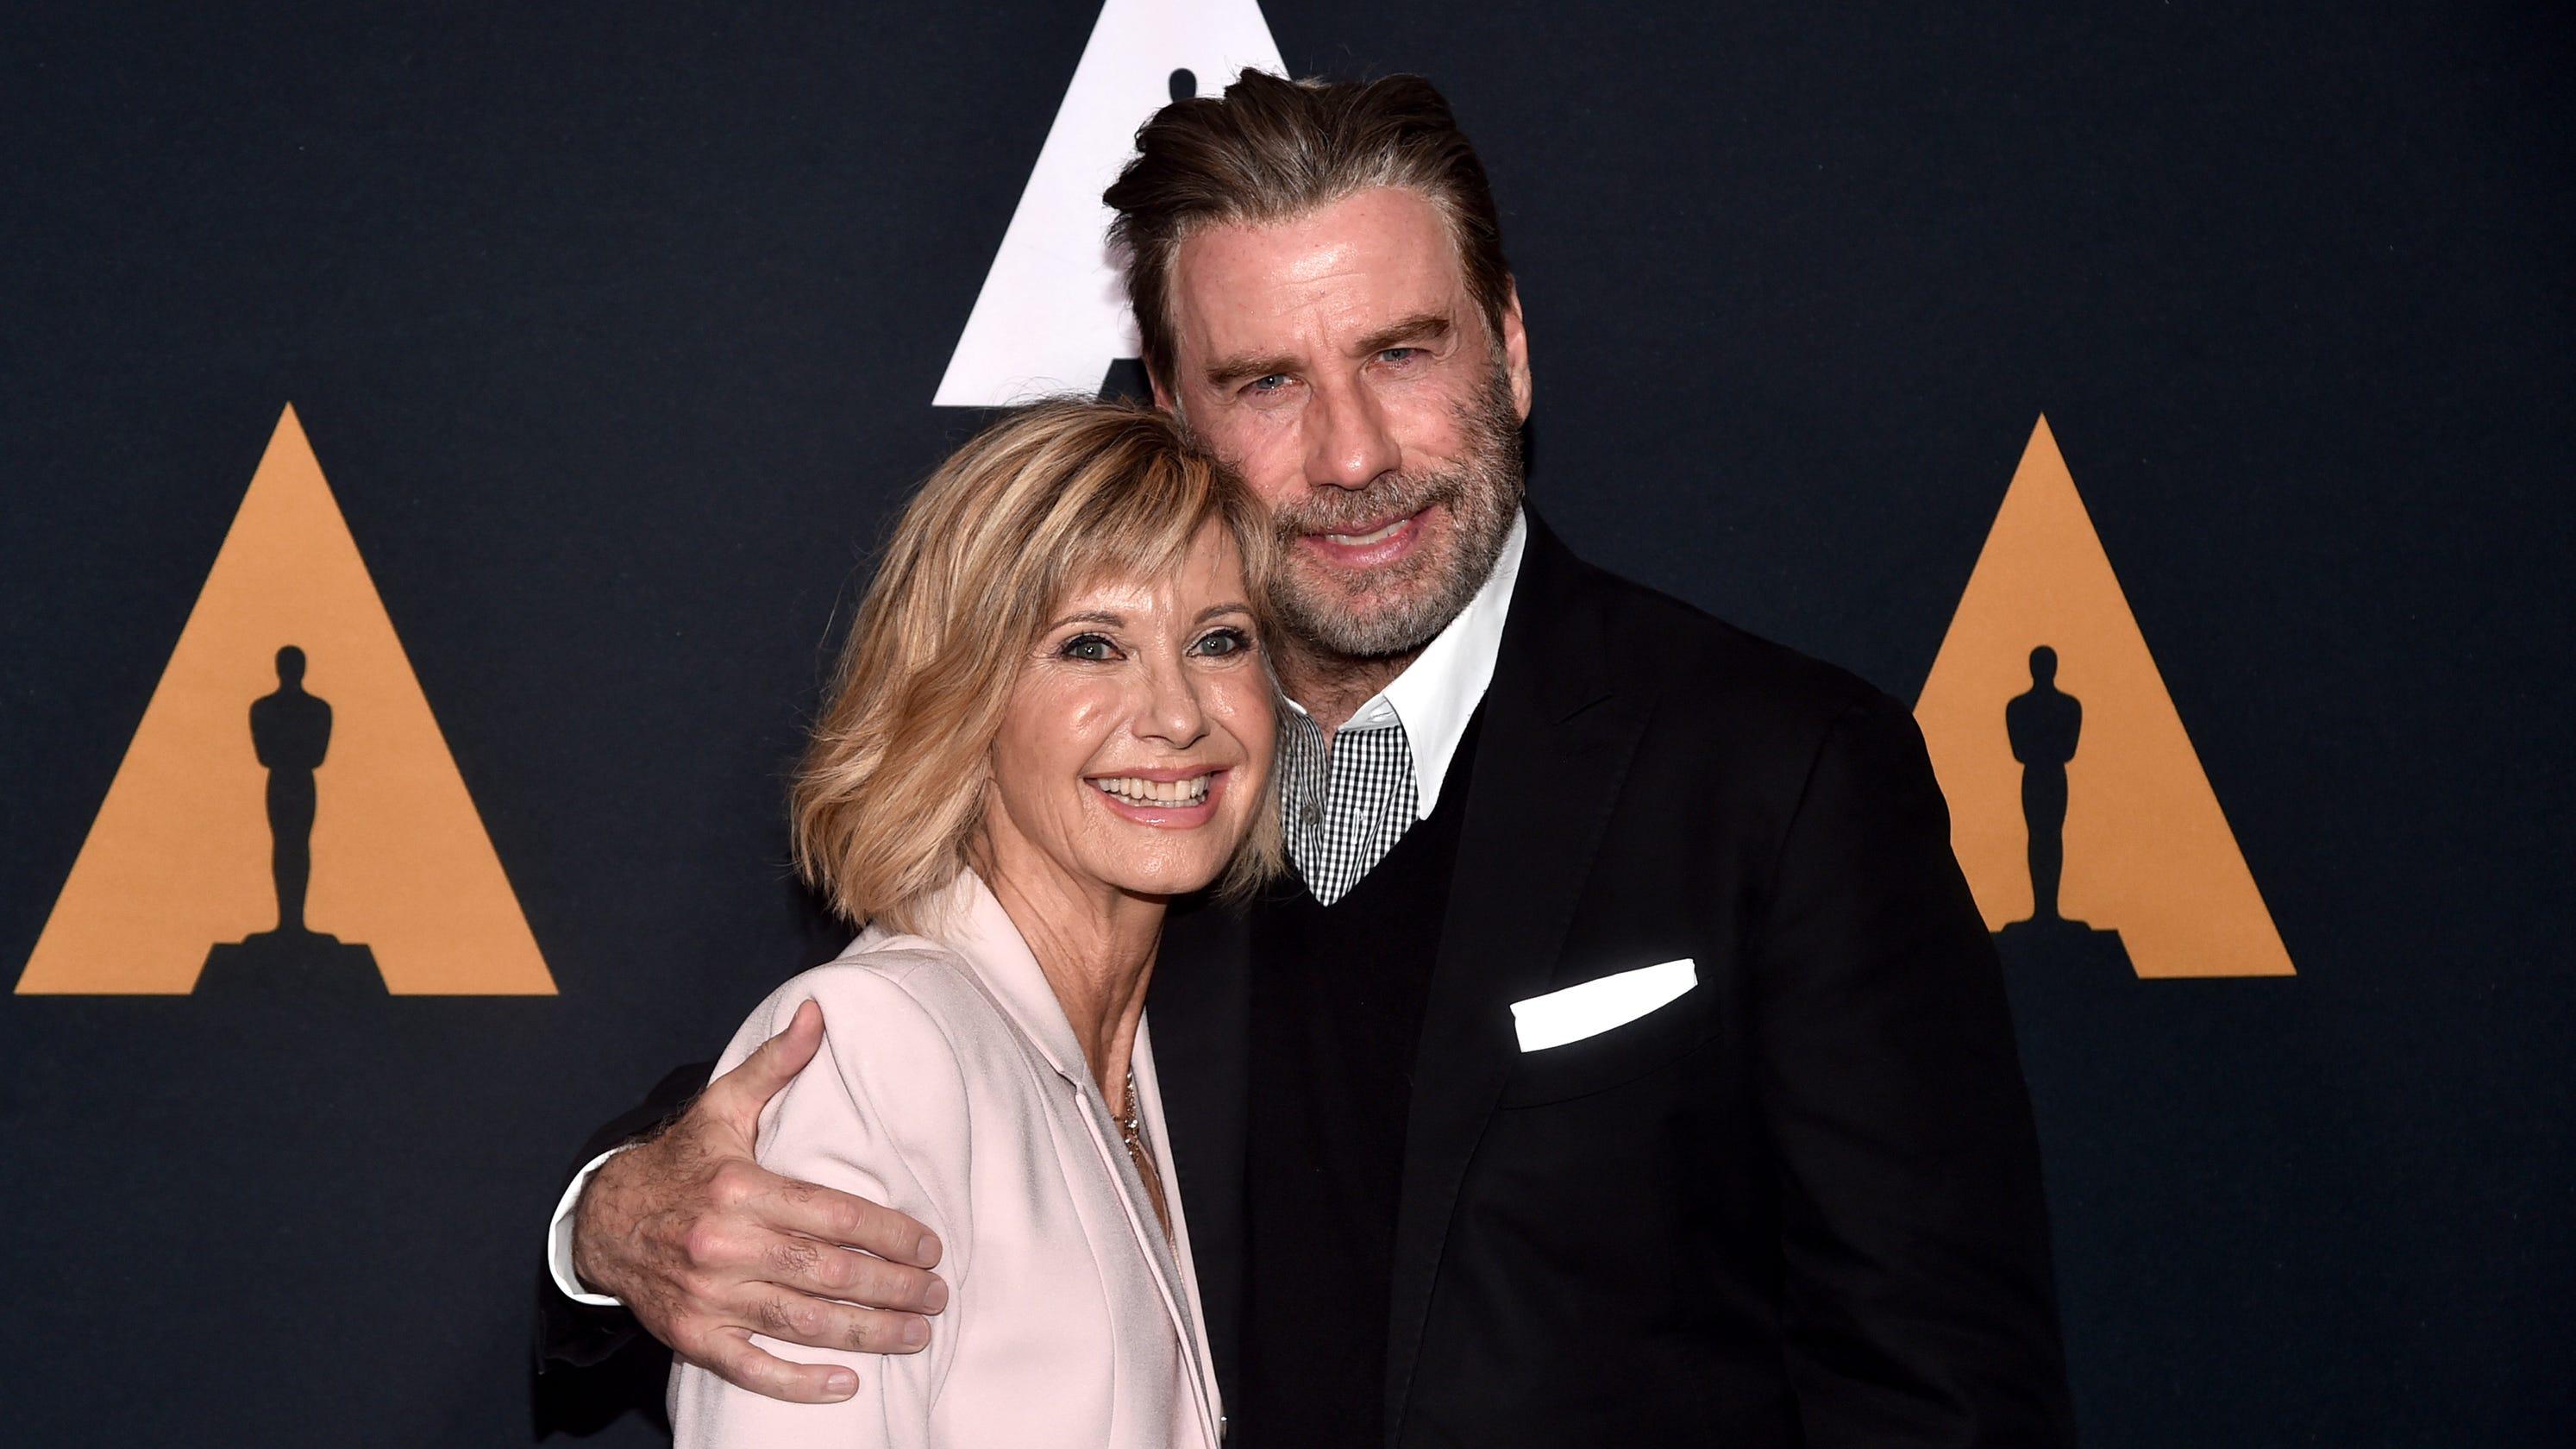 John Travolta is 'very proud' of Olivia Newton-John as she battles cancer for third time